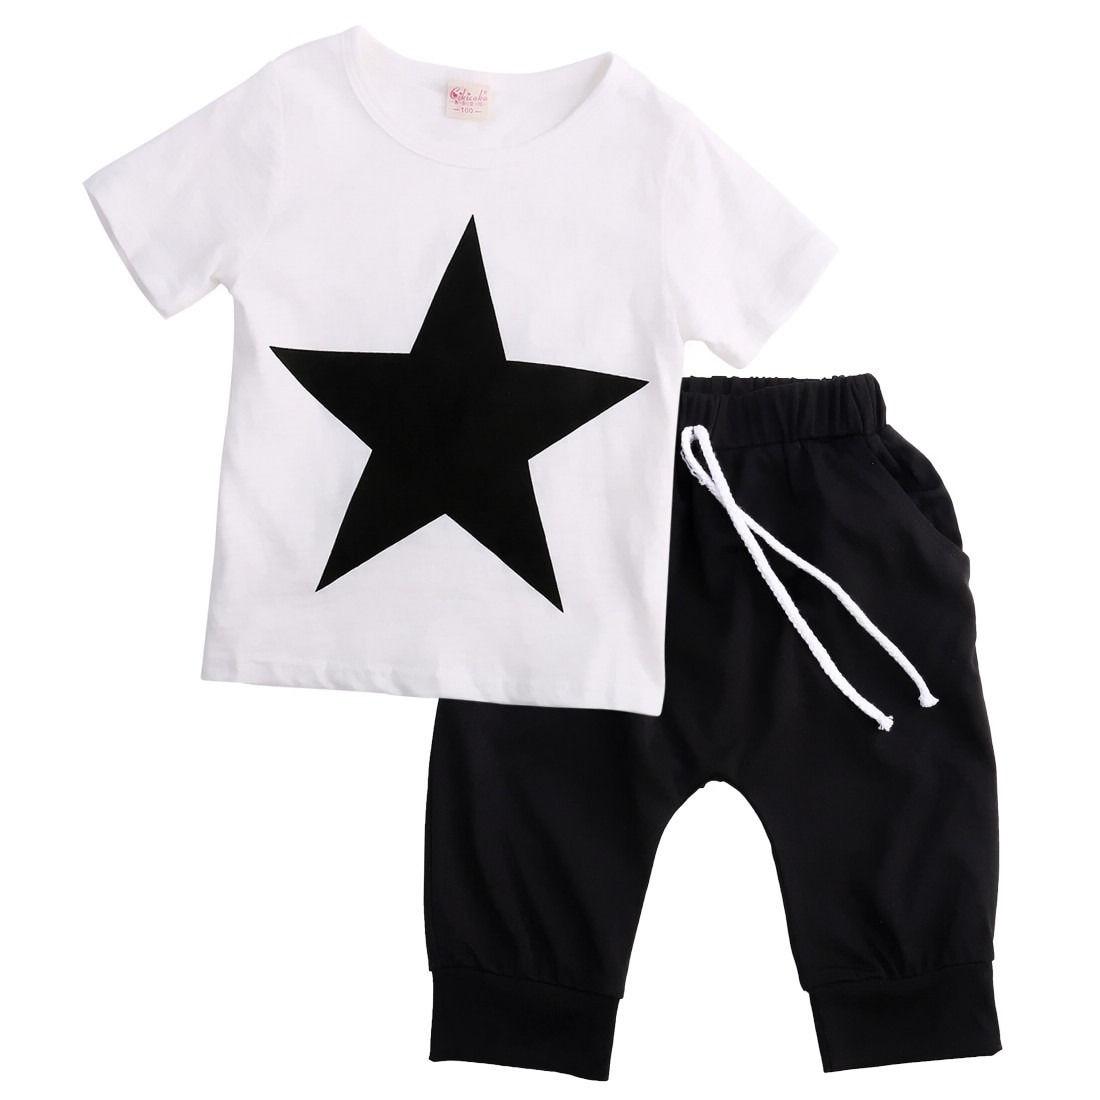 88c904702bd9 Pop Kids Baby Bambini Casual Star T-shirt Top +Pantaloni Harem Outfit 2 pz  Set